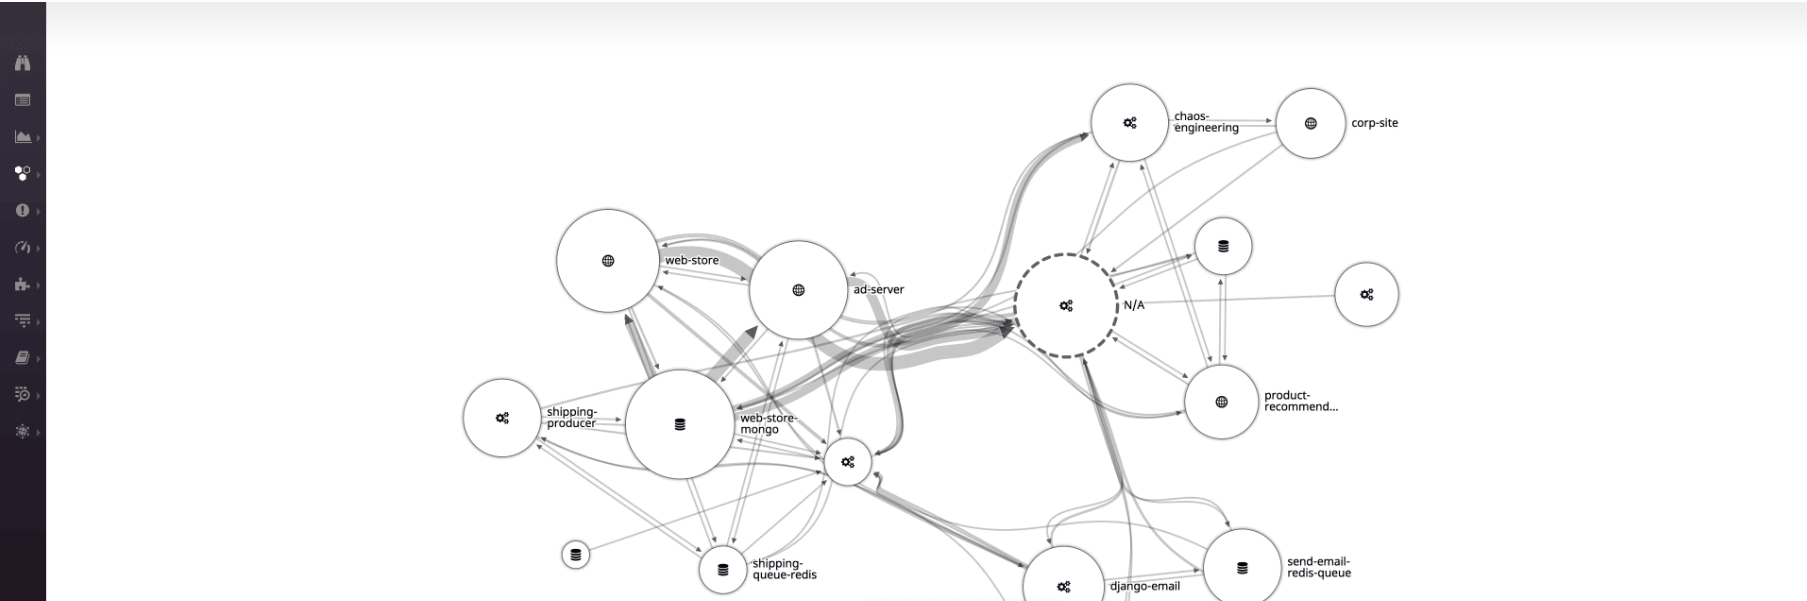 DATA dog- Network Monitor Tool